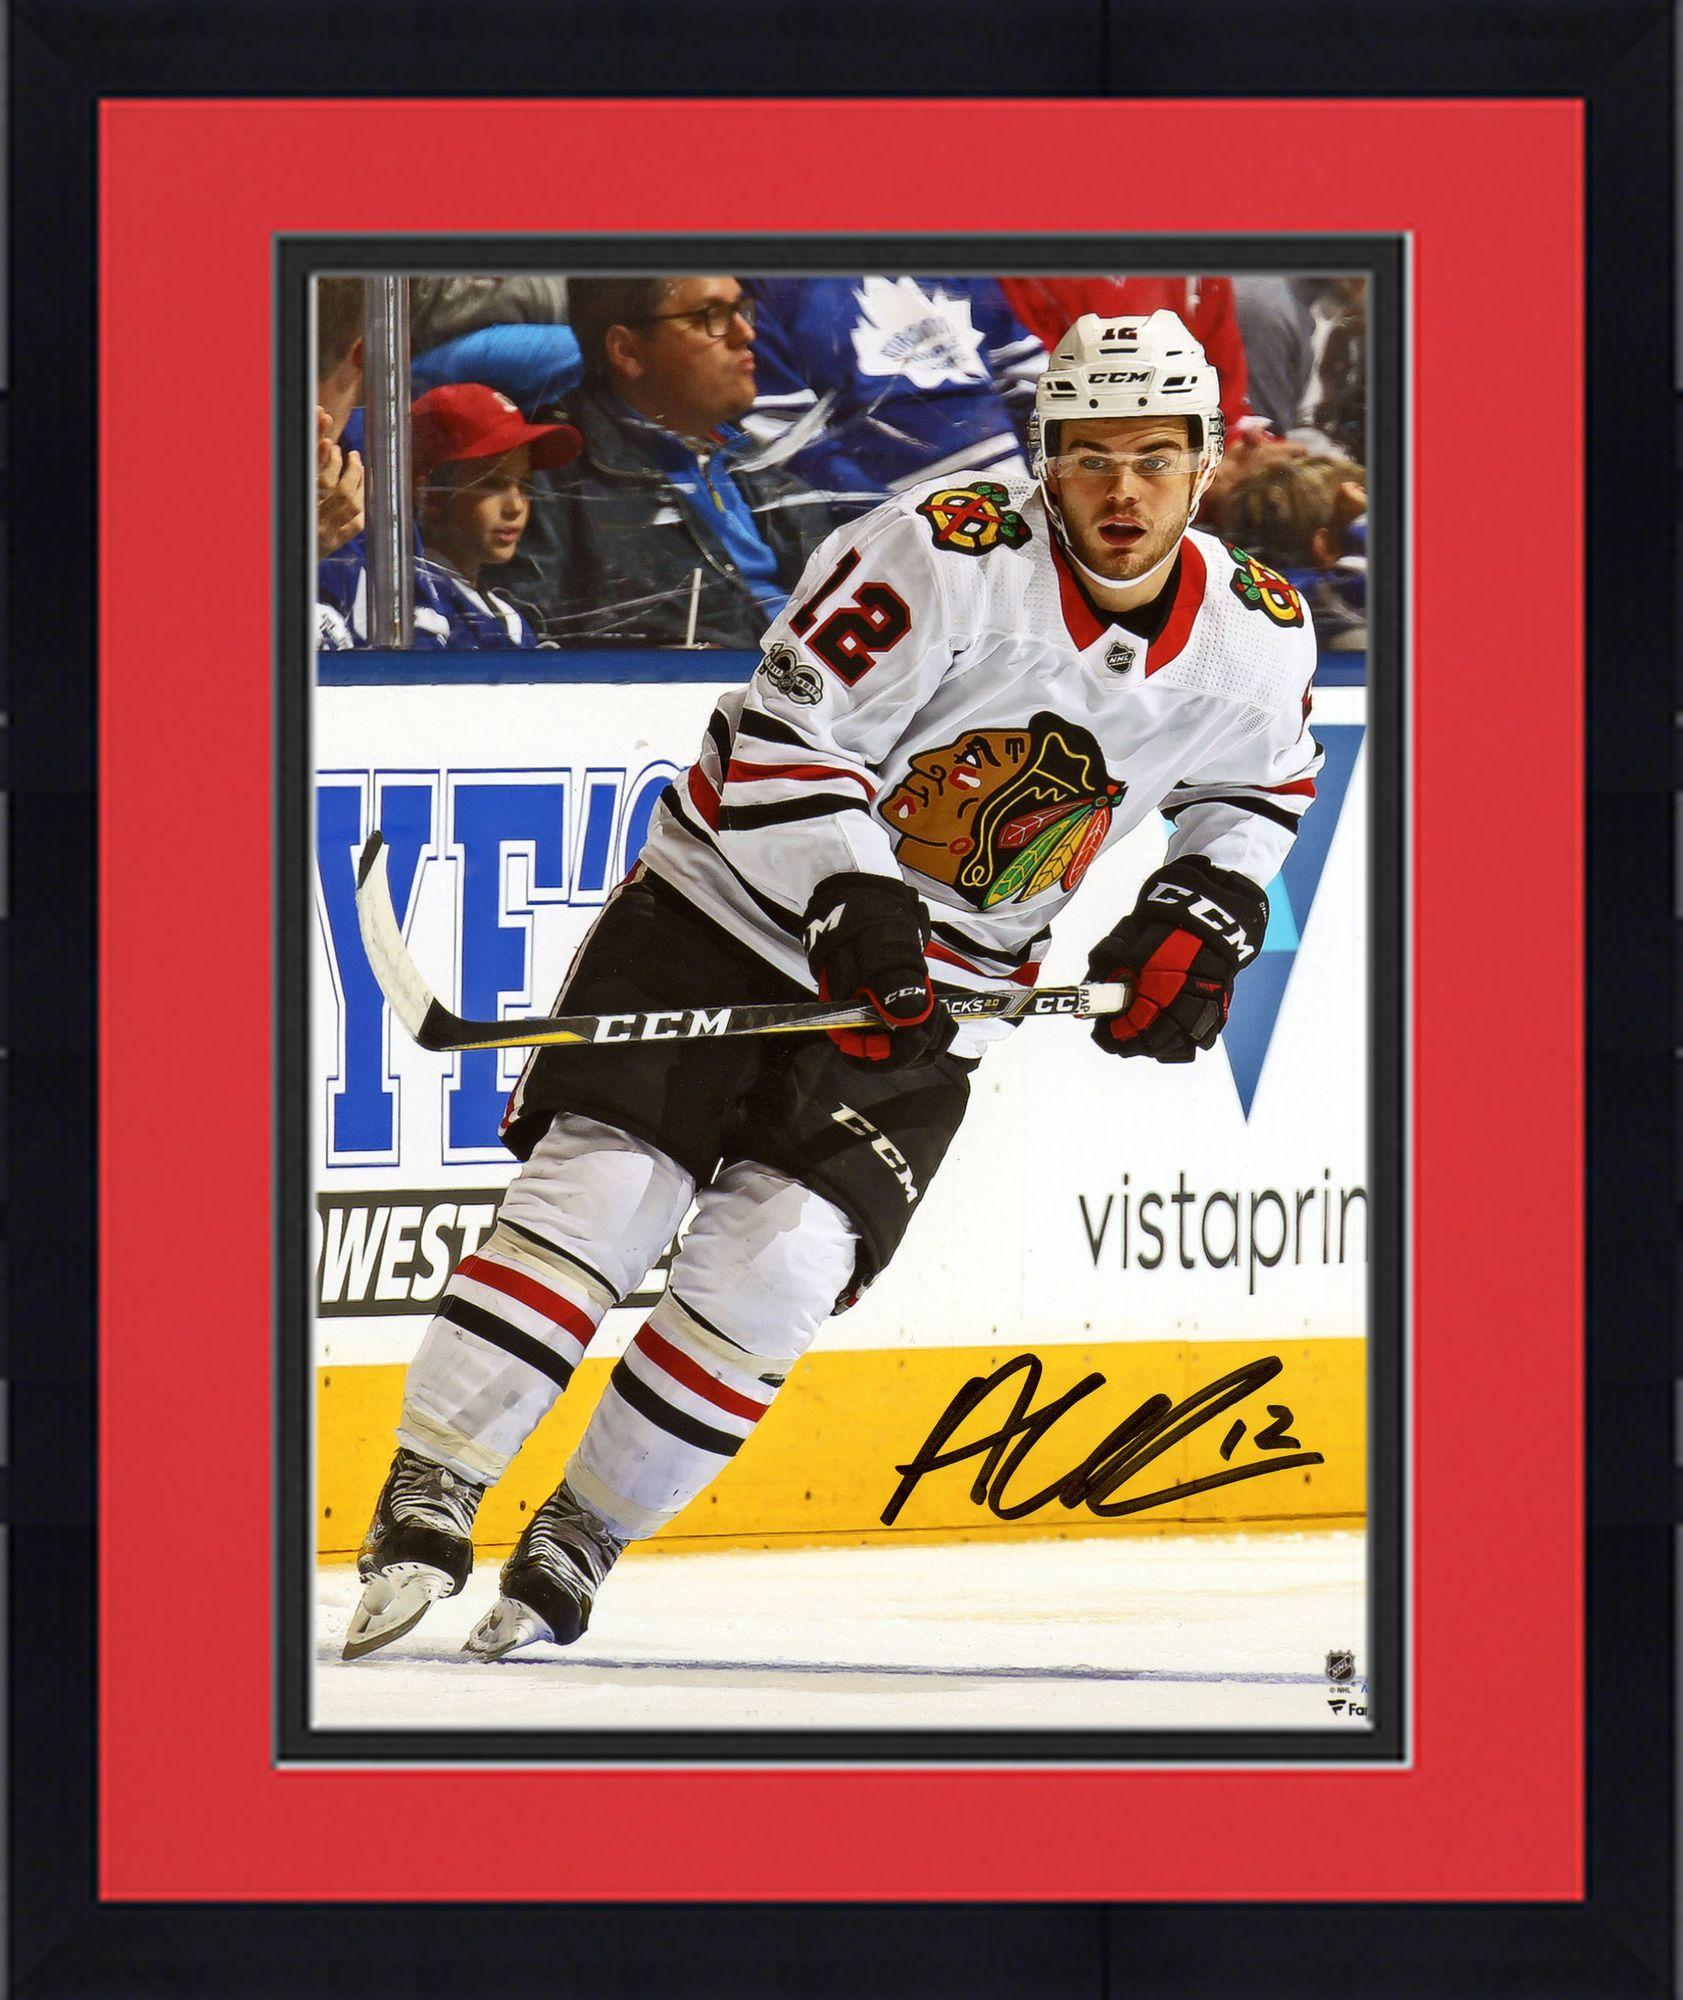 "Framed Alex DeBrincat Chicago Blackhawks Autographed 8"" x 10"" White Jersey Skating Photograph Fanatics... by Fanatics Authentic"